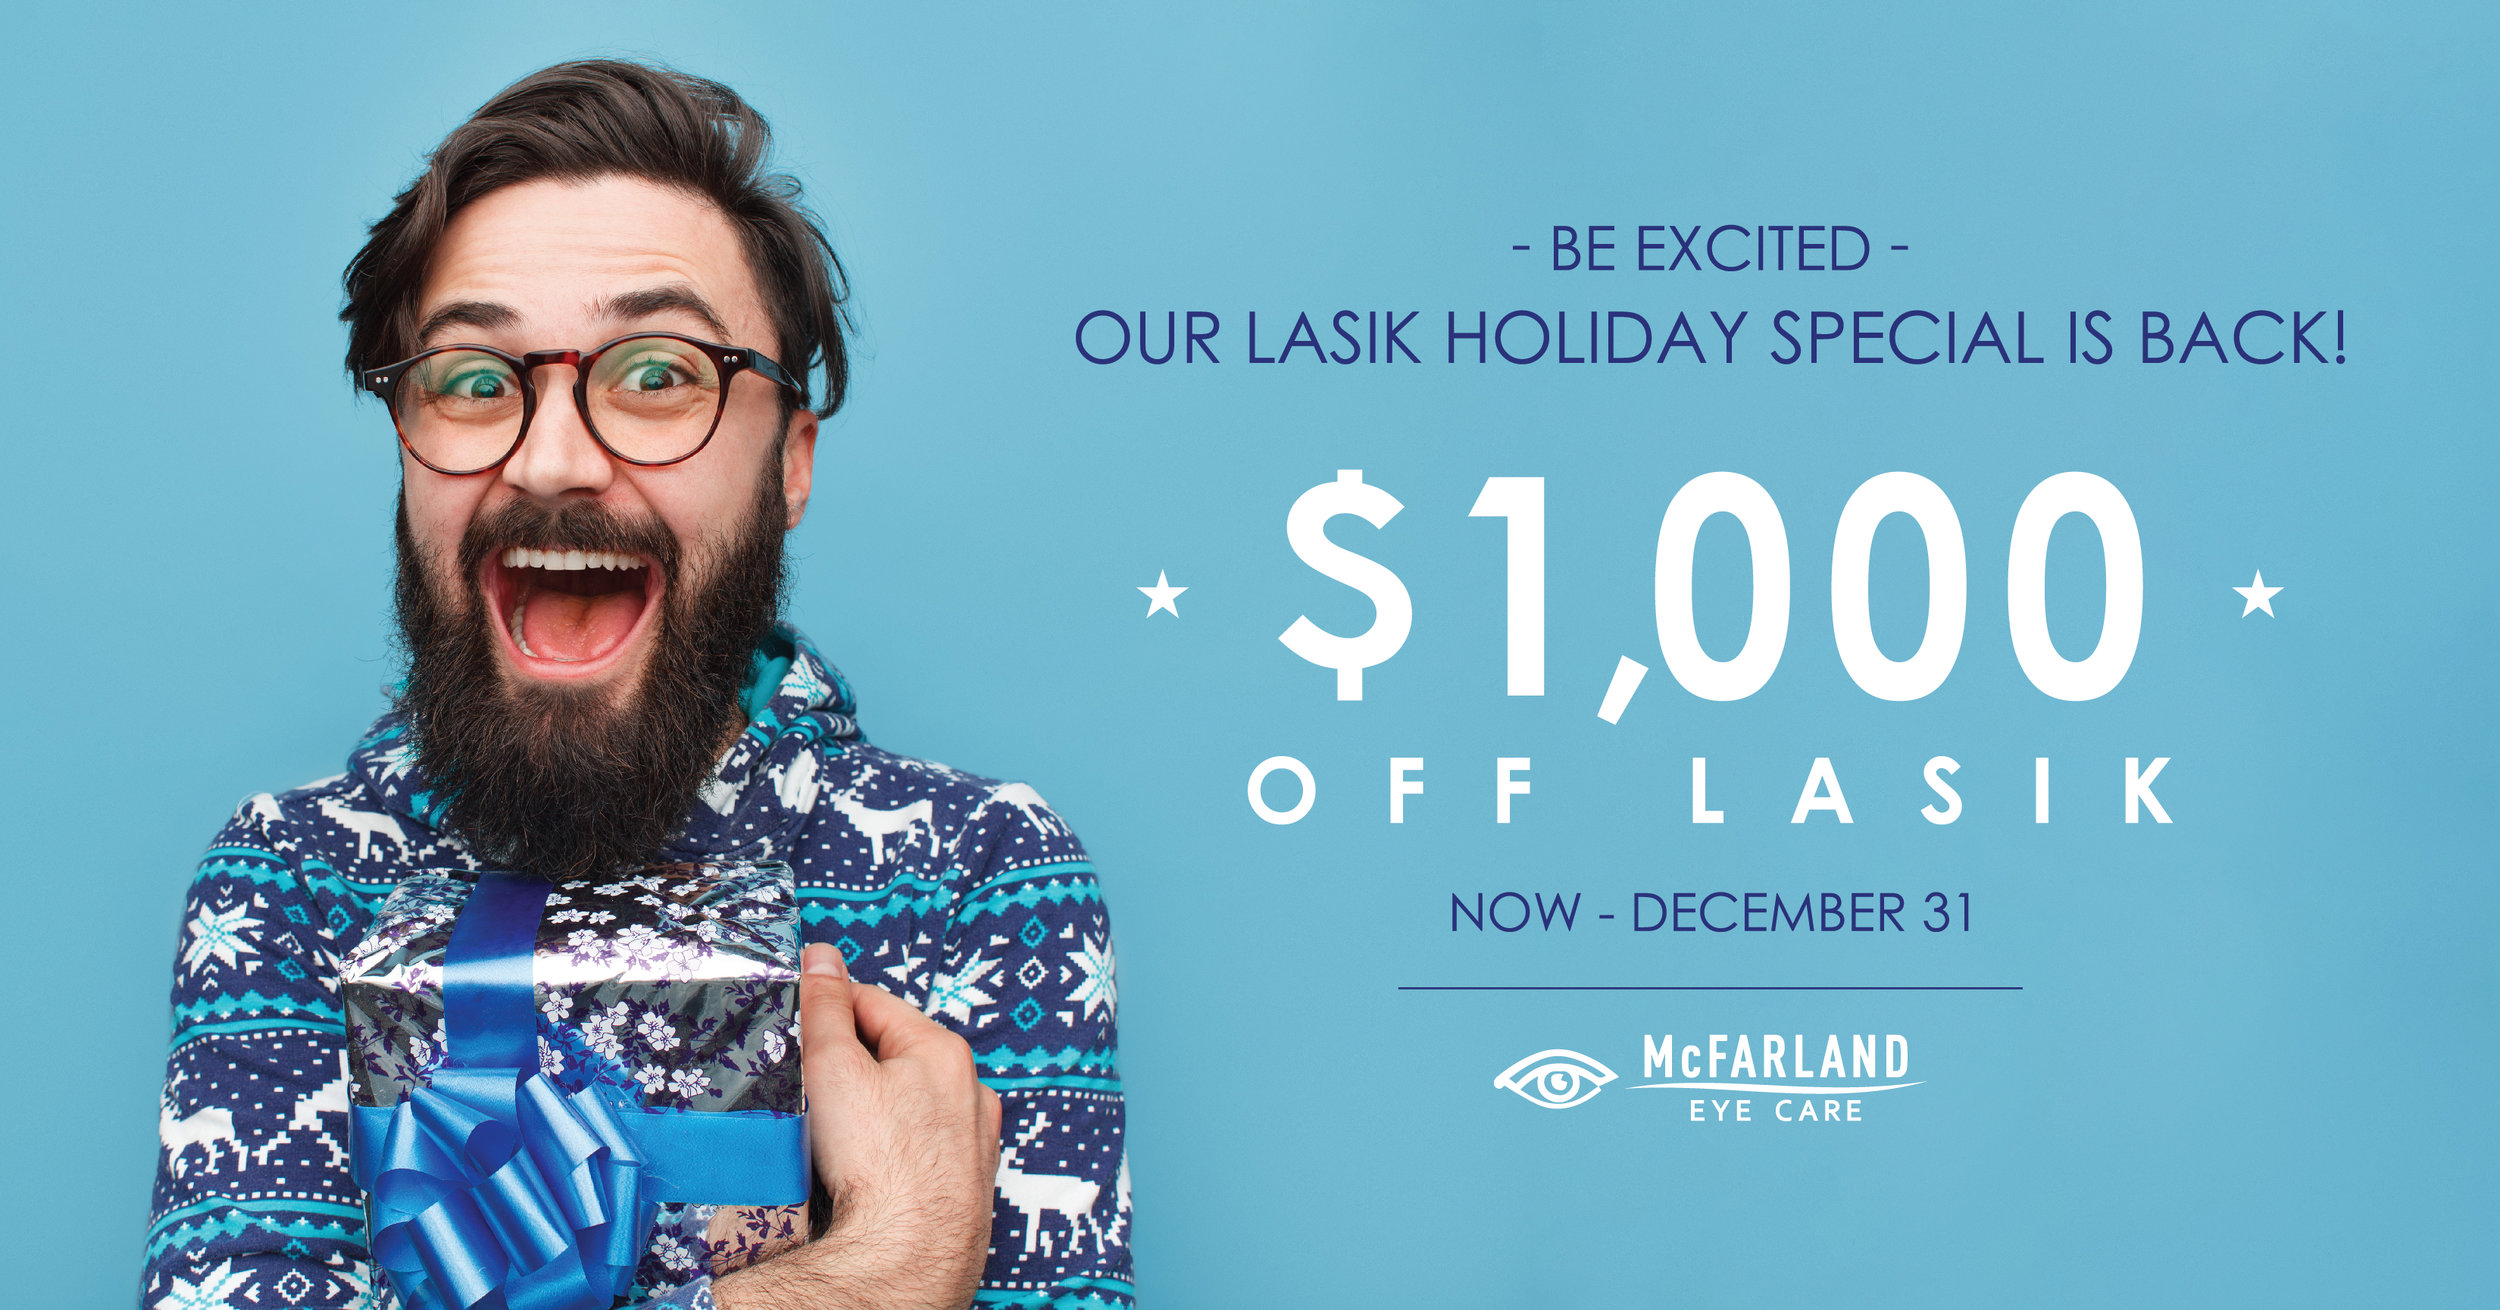 LASIK Holiday Special McFarland Eye Care